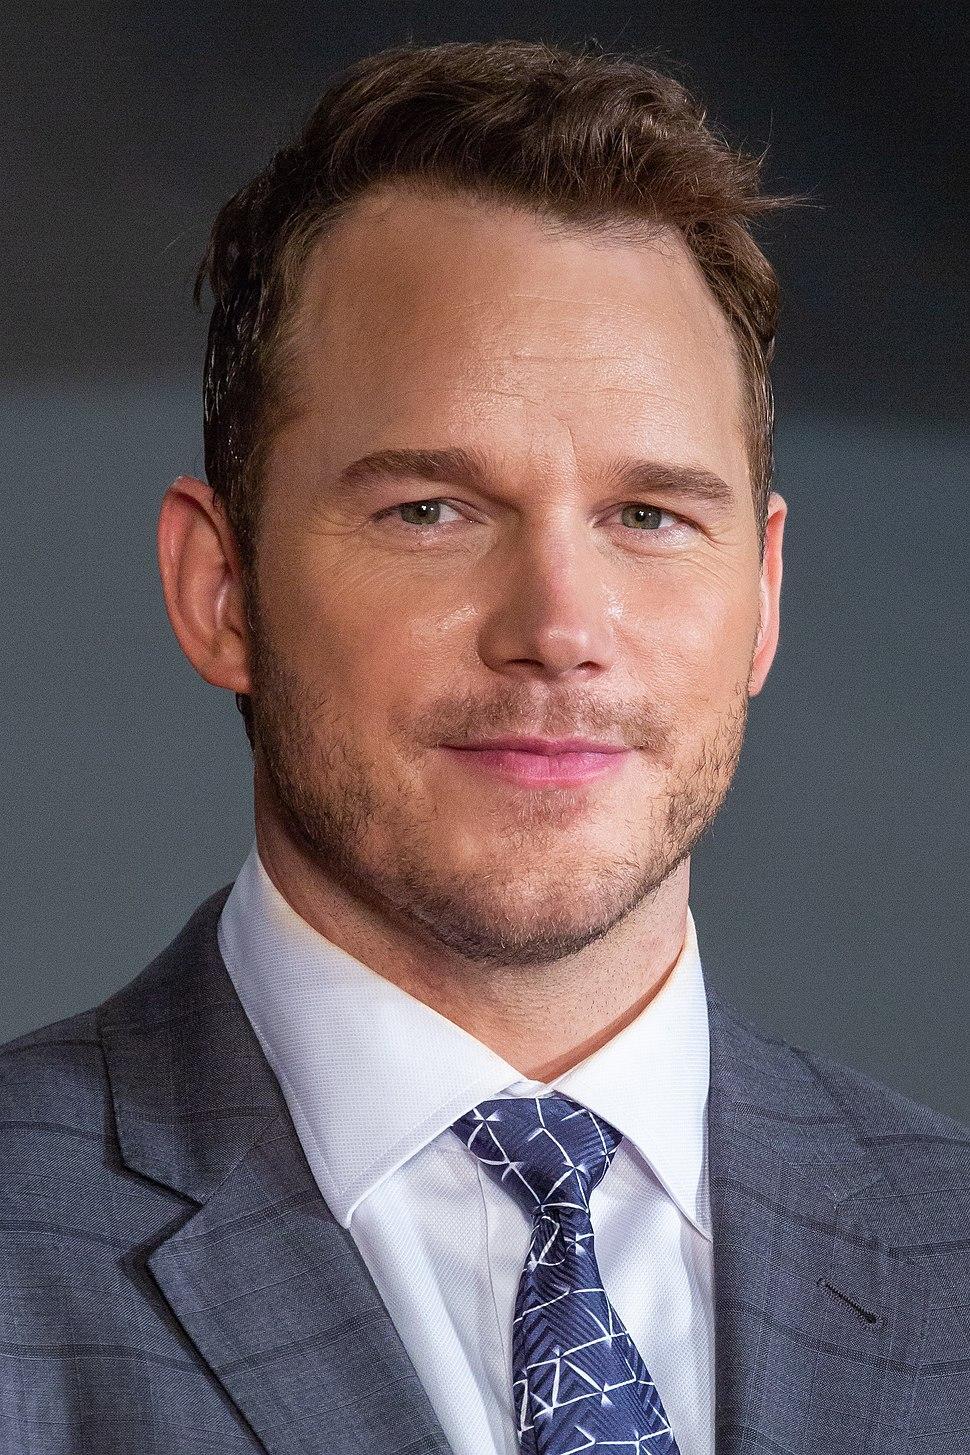 Chris Pratt 2018